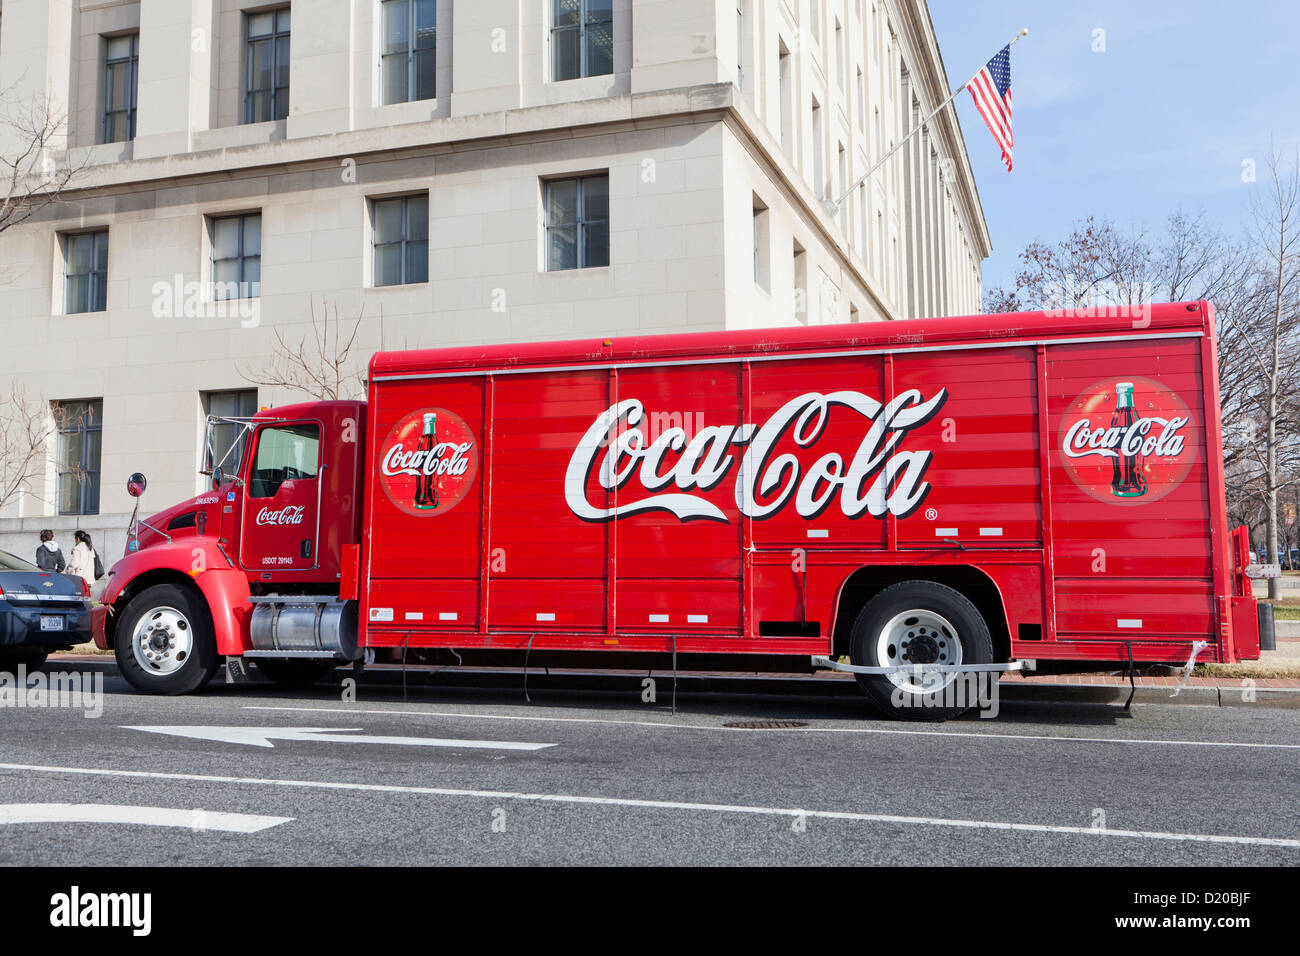 Coca-Cola delivery truck - USA - Stock Image